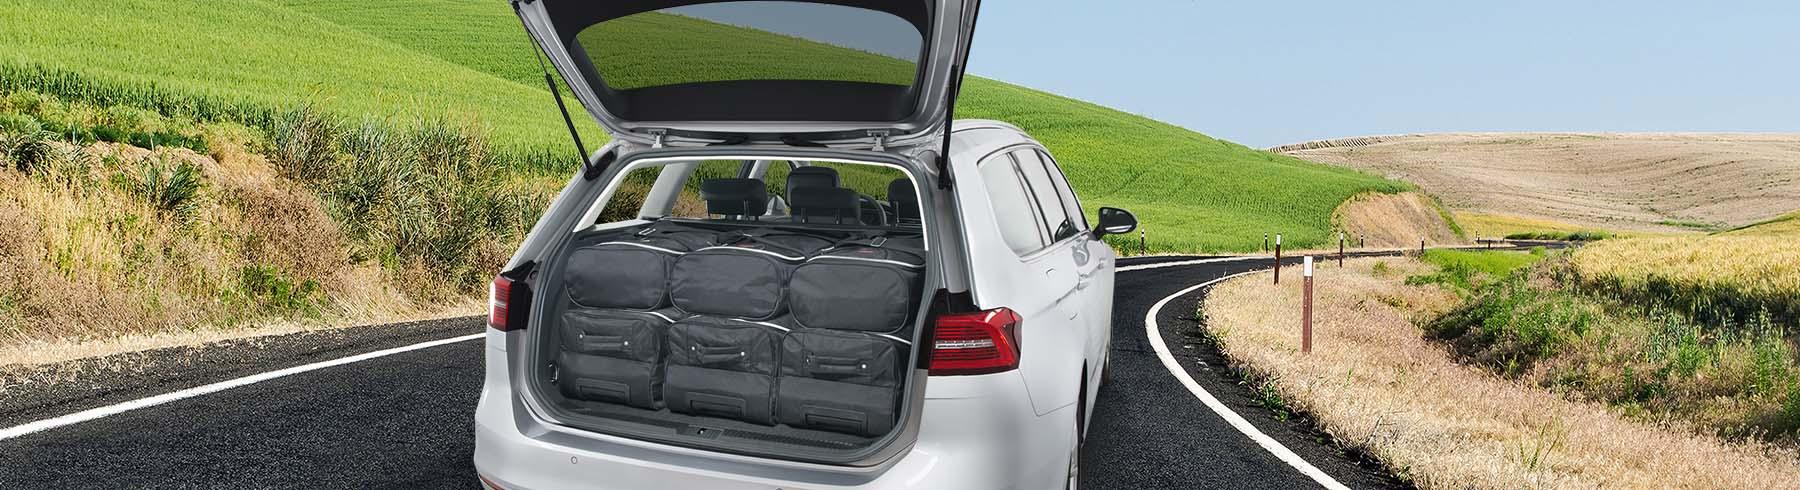 car-bags-concept-summer-02